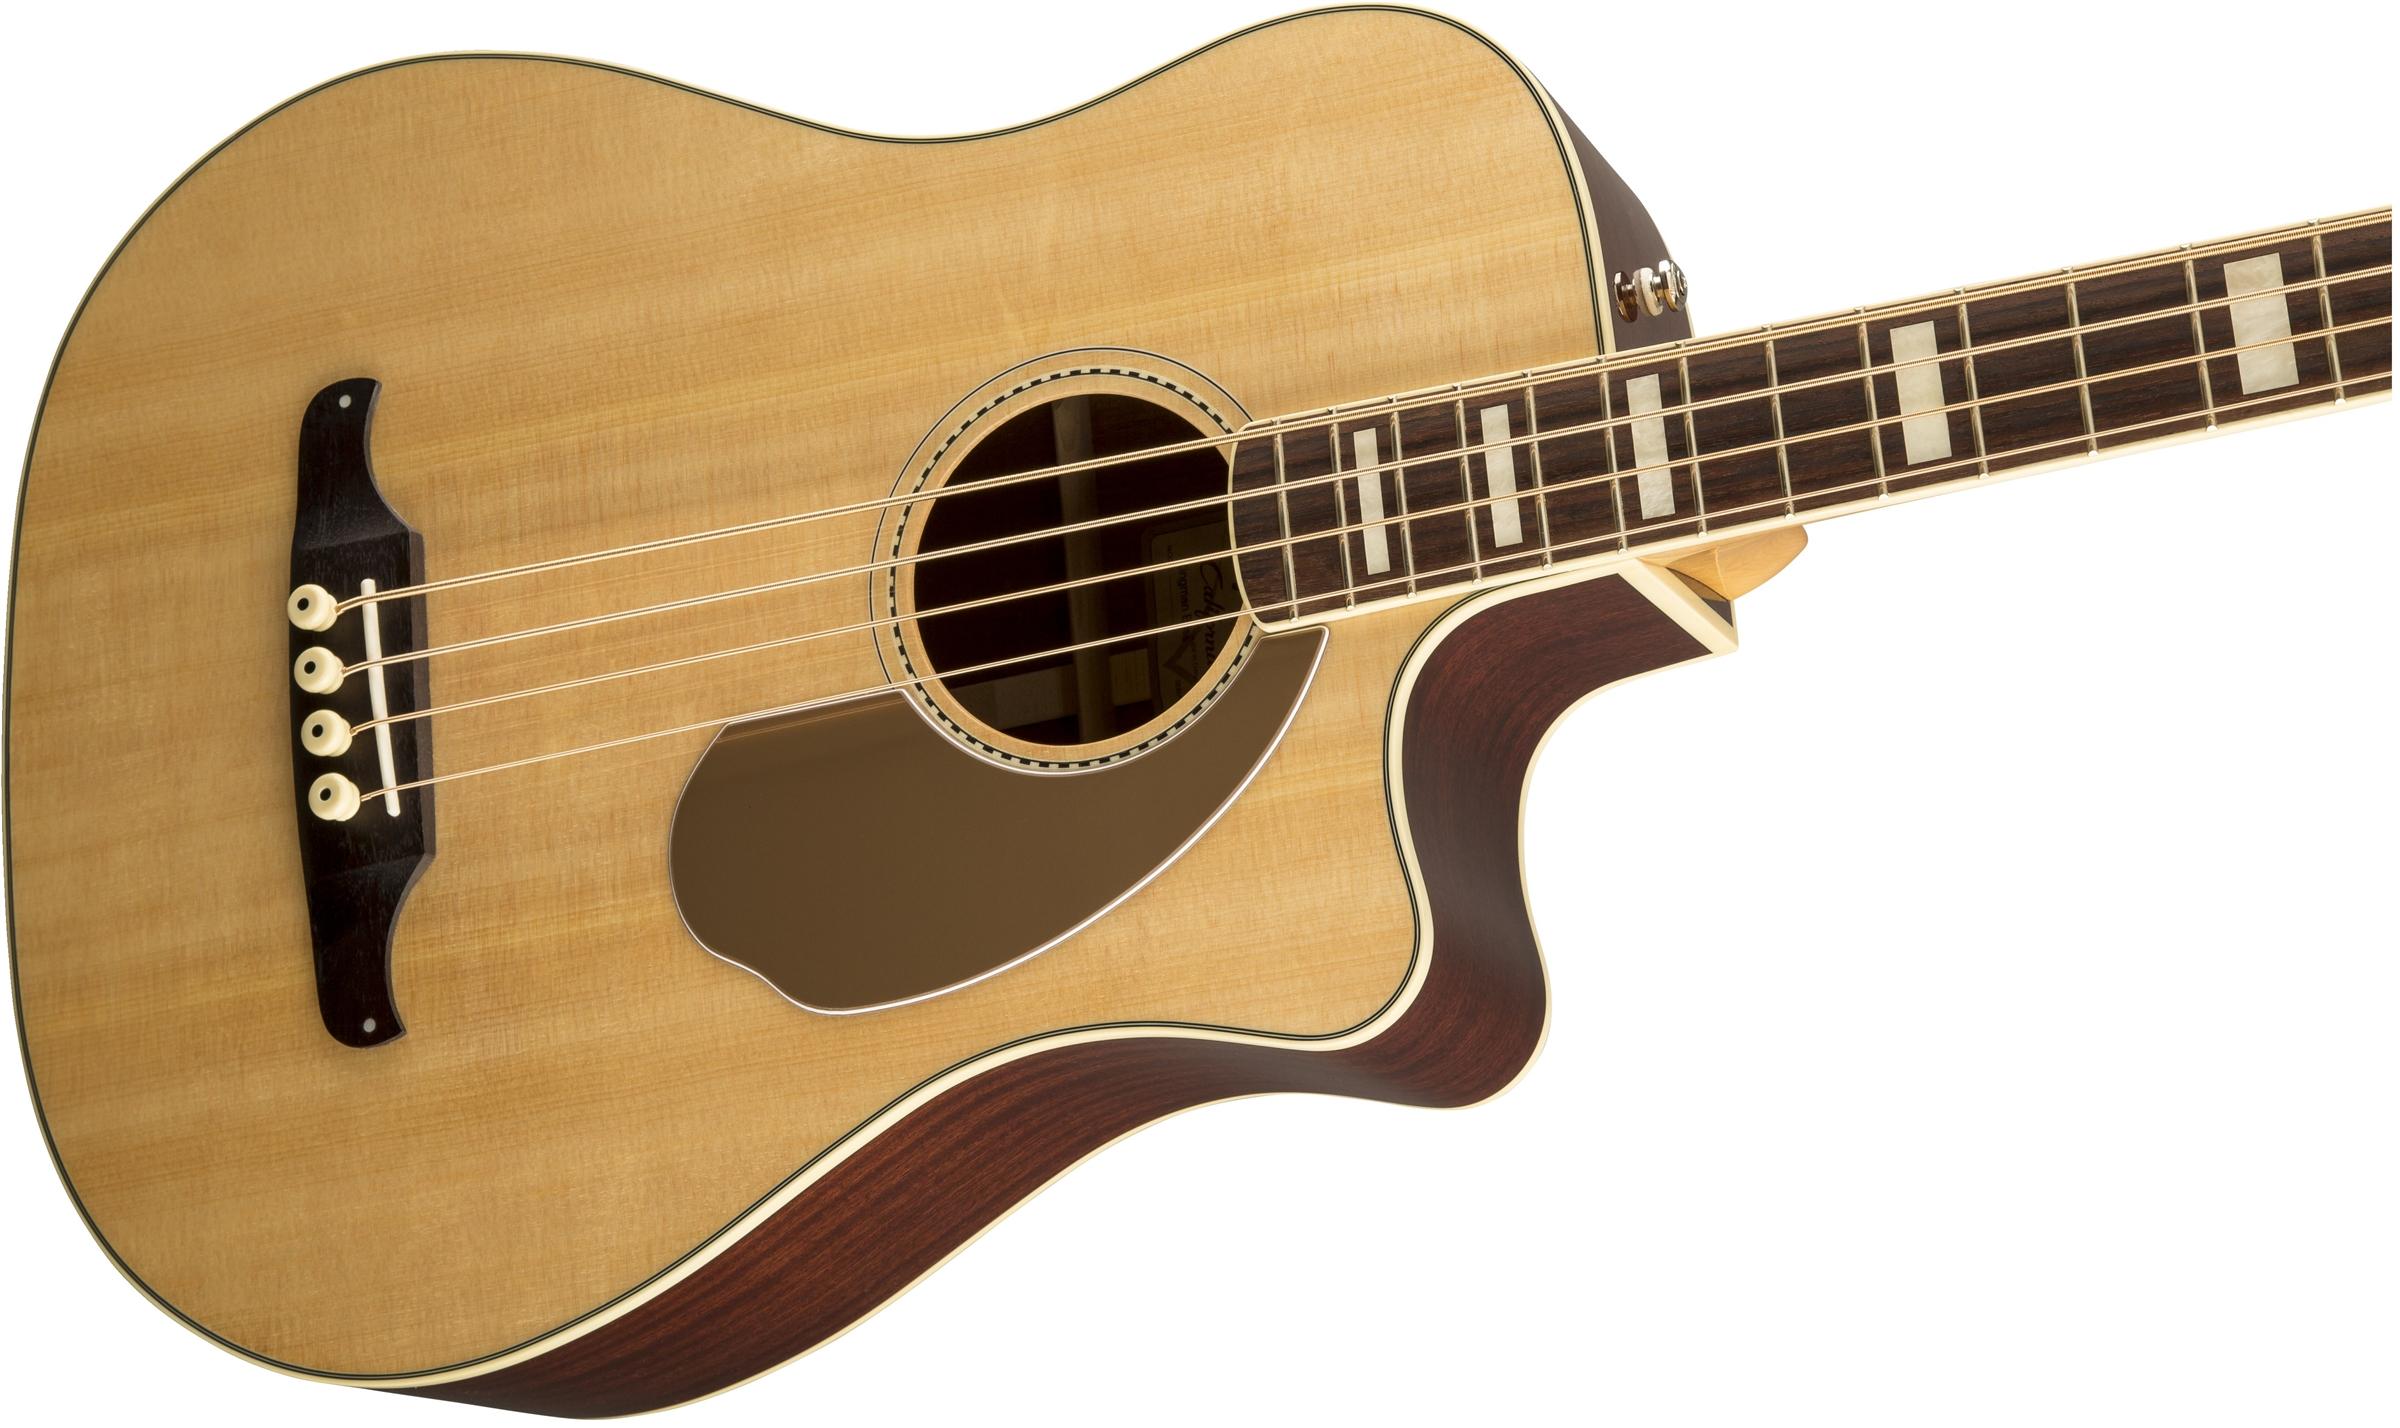 Fender Kingman™ Bass SCE Natural Rosewood Fingerboard Acoustic Electric Bass Guitar